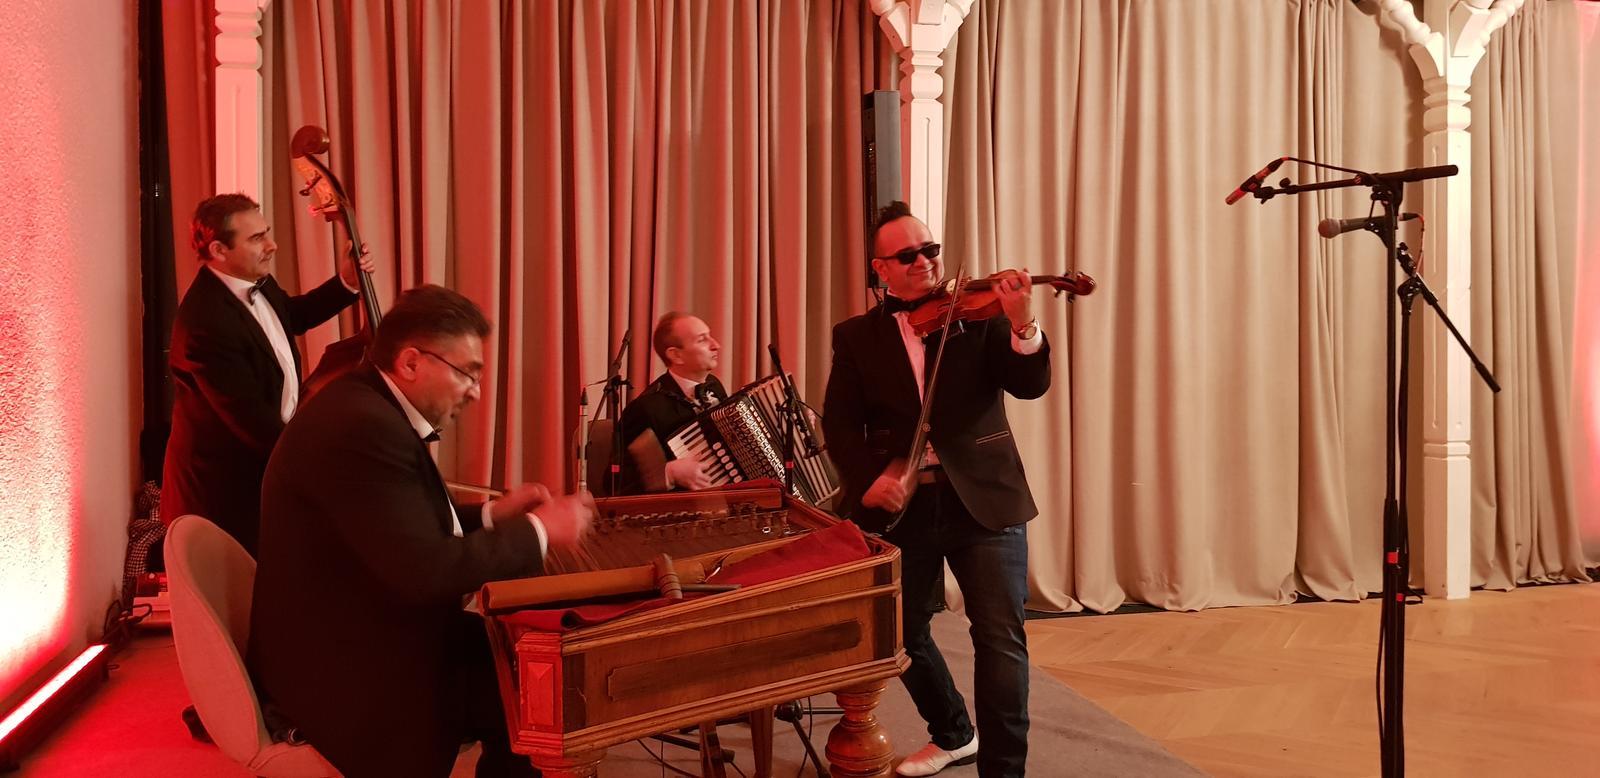 Cimbalovka Diamond Band - Obrázok č. 1